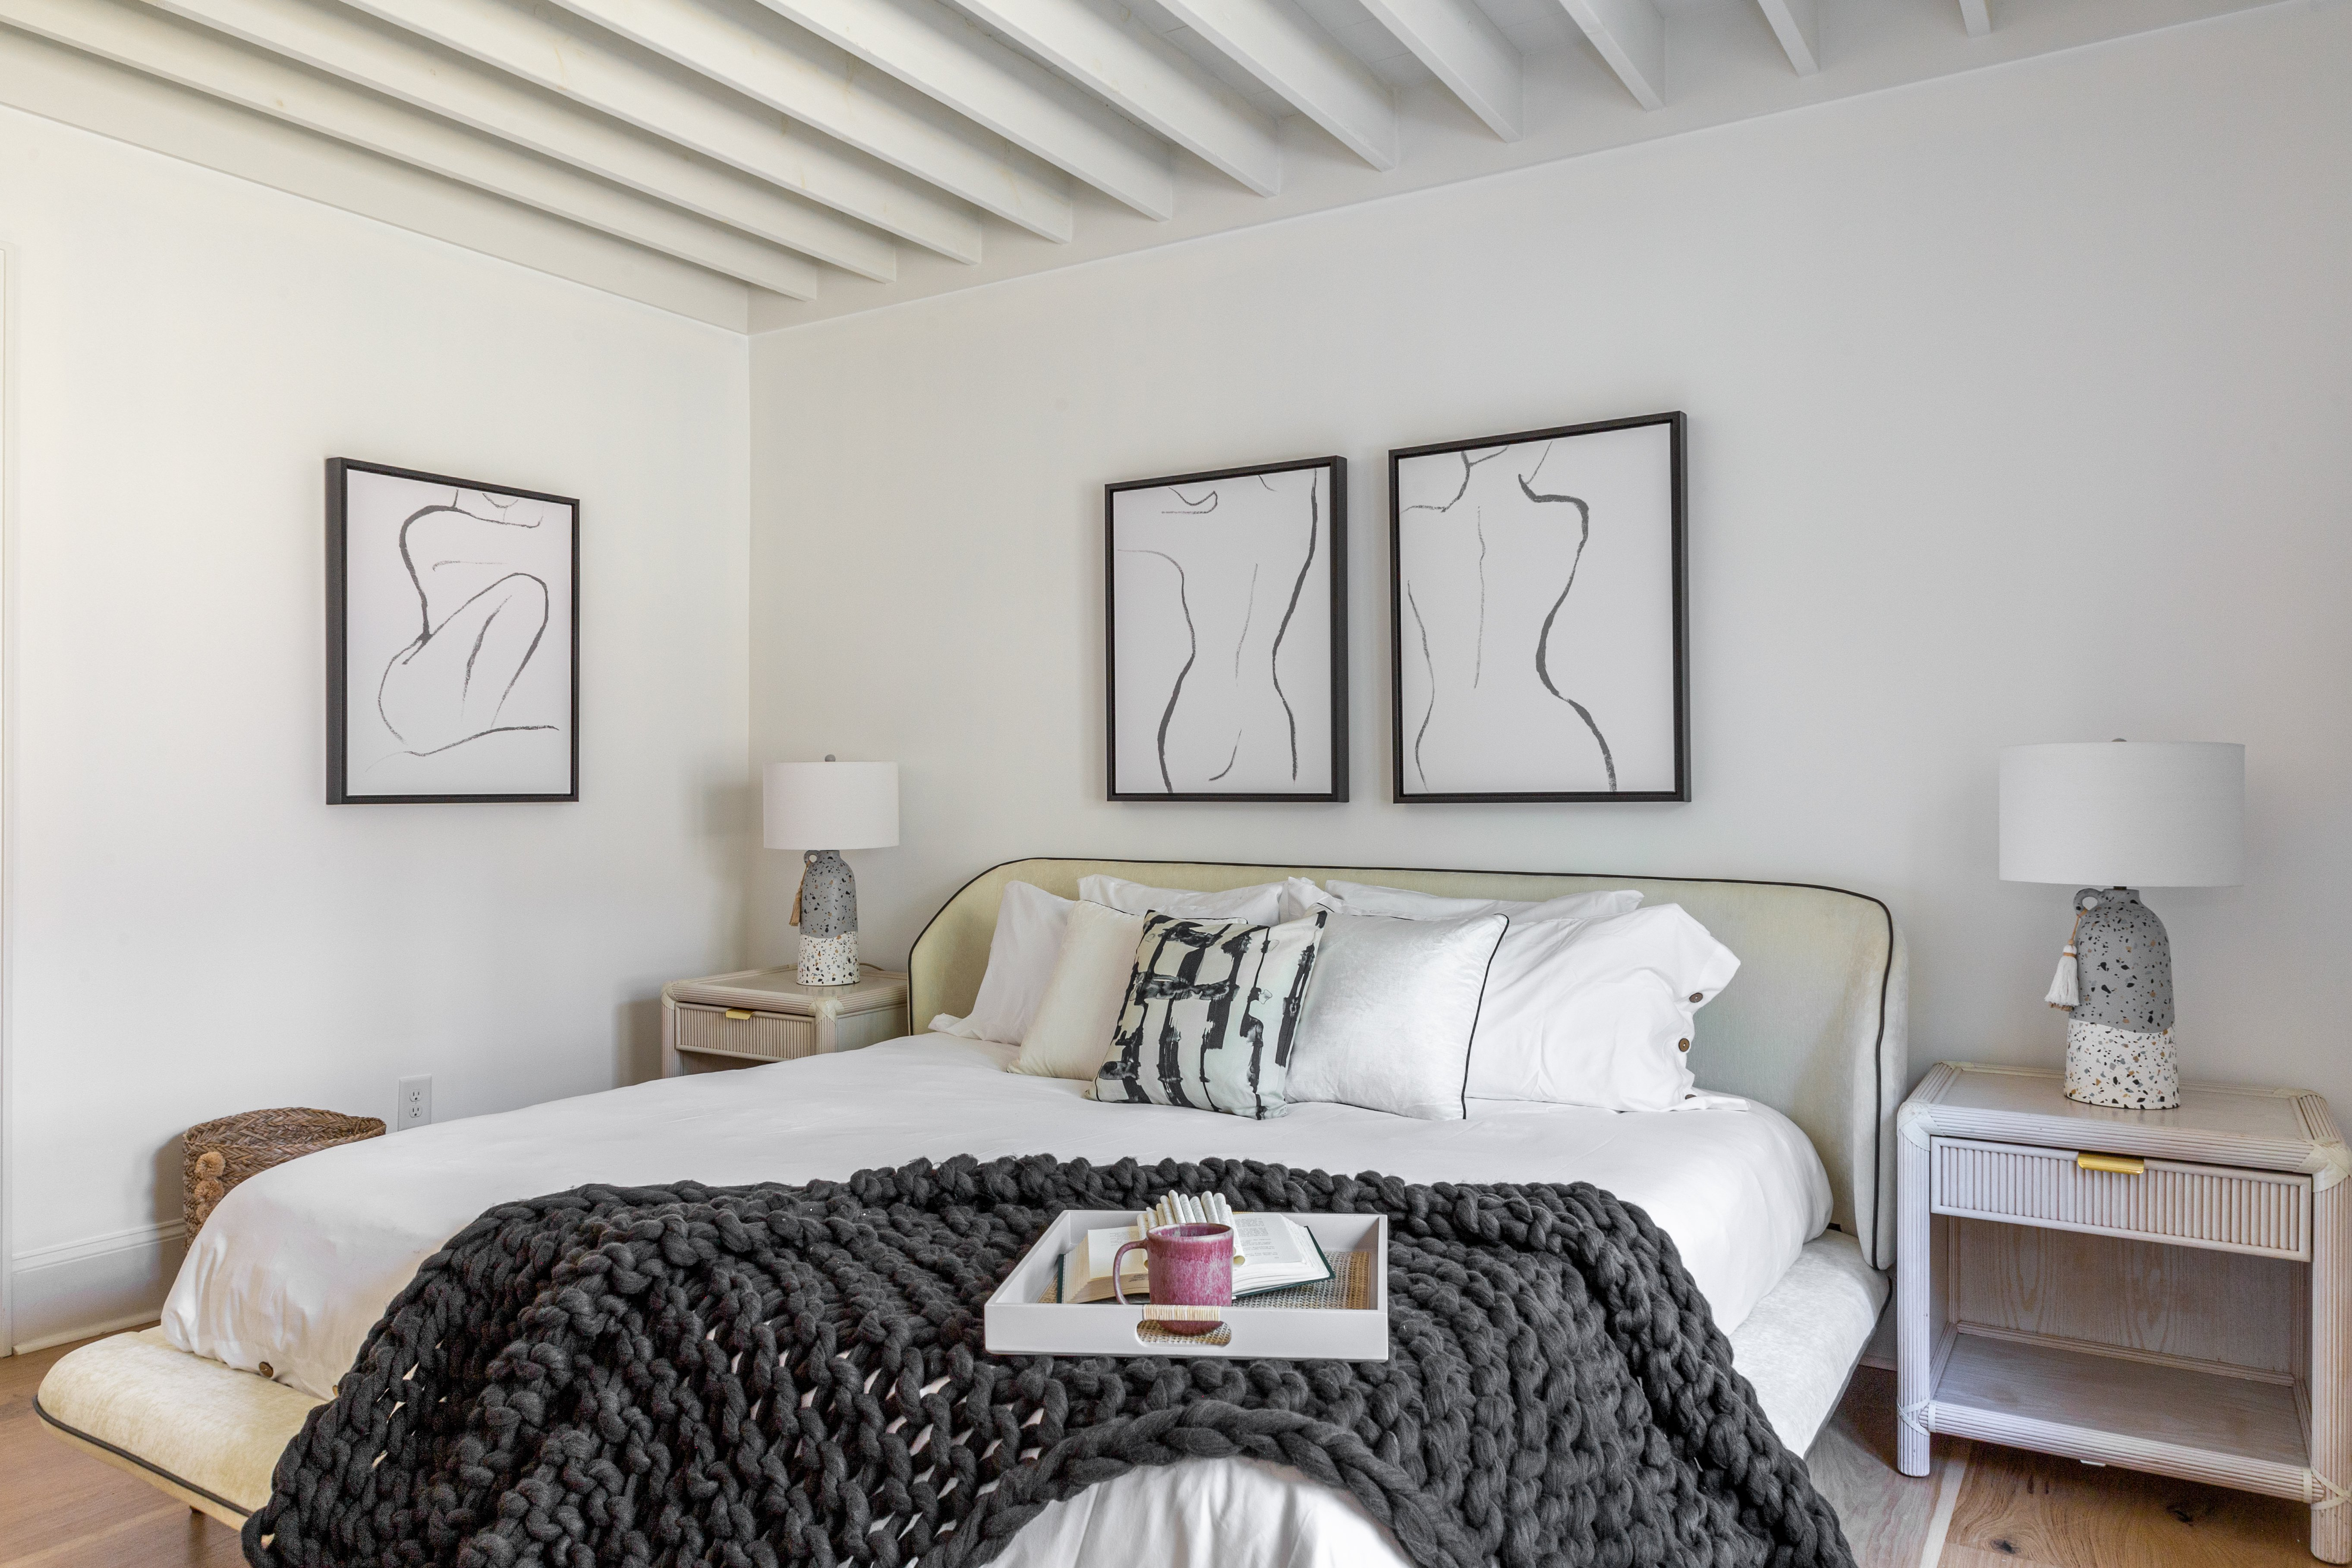 03 master bedroom 20210721-IMG_0091-HDR.jpg